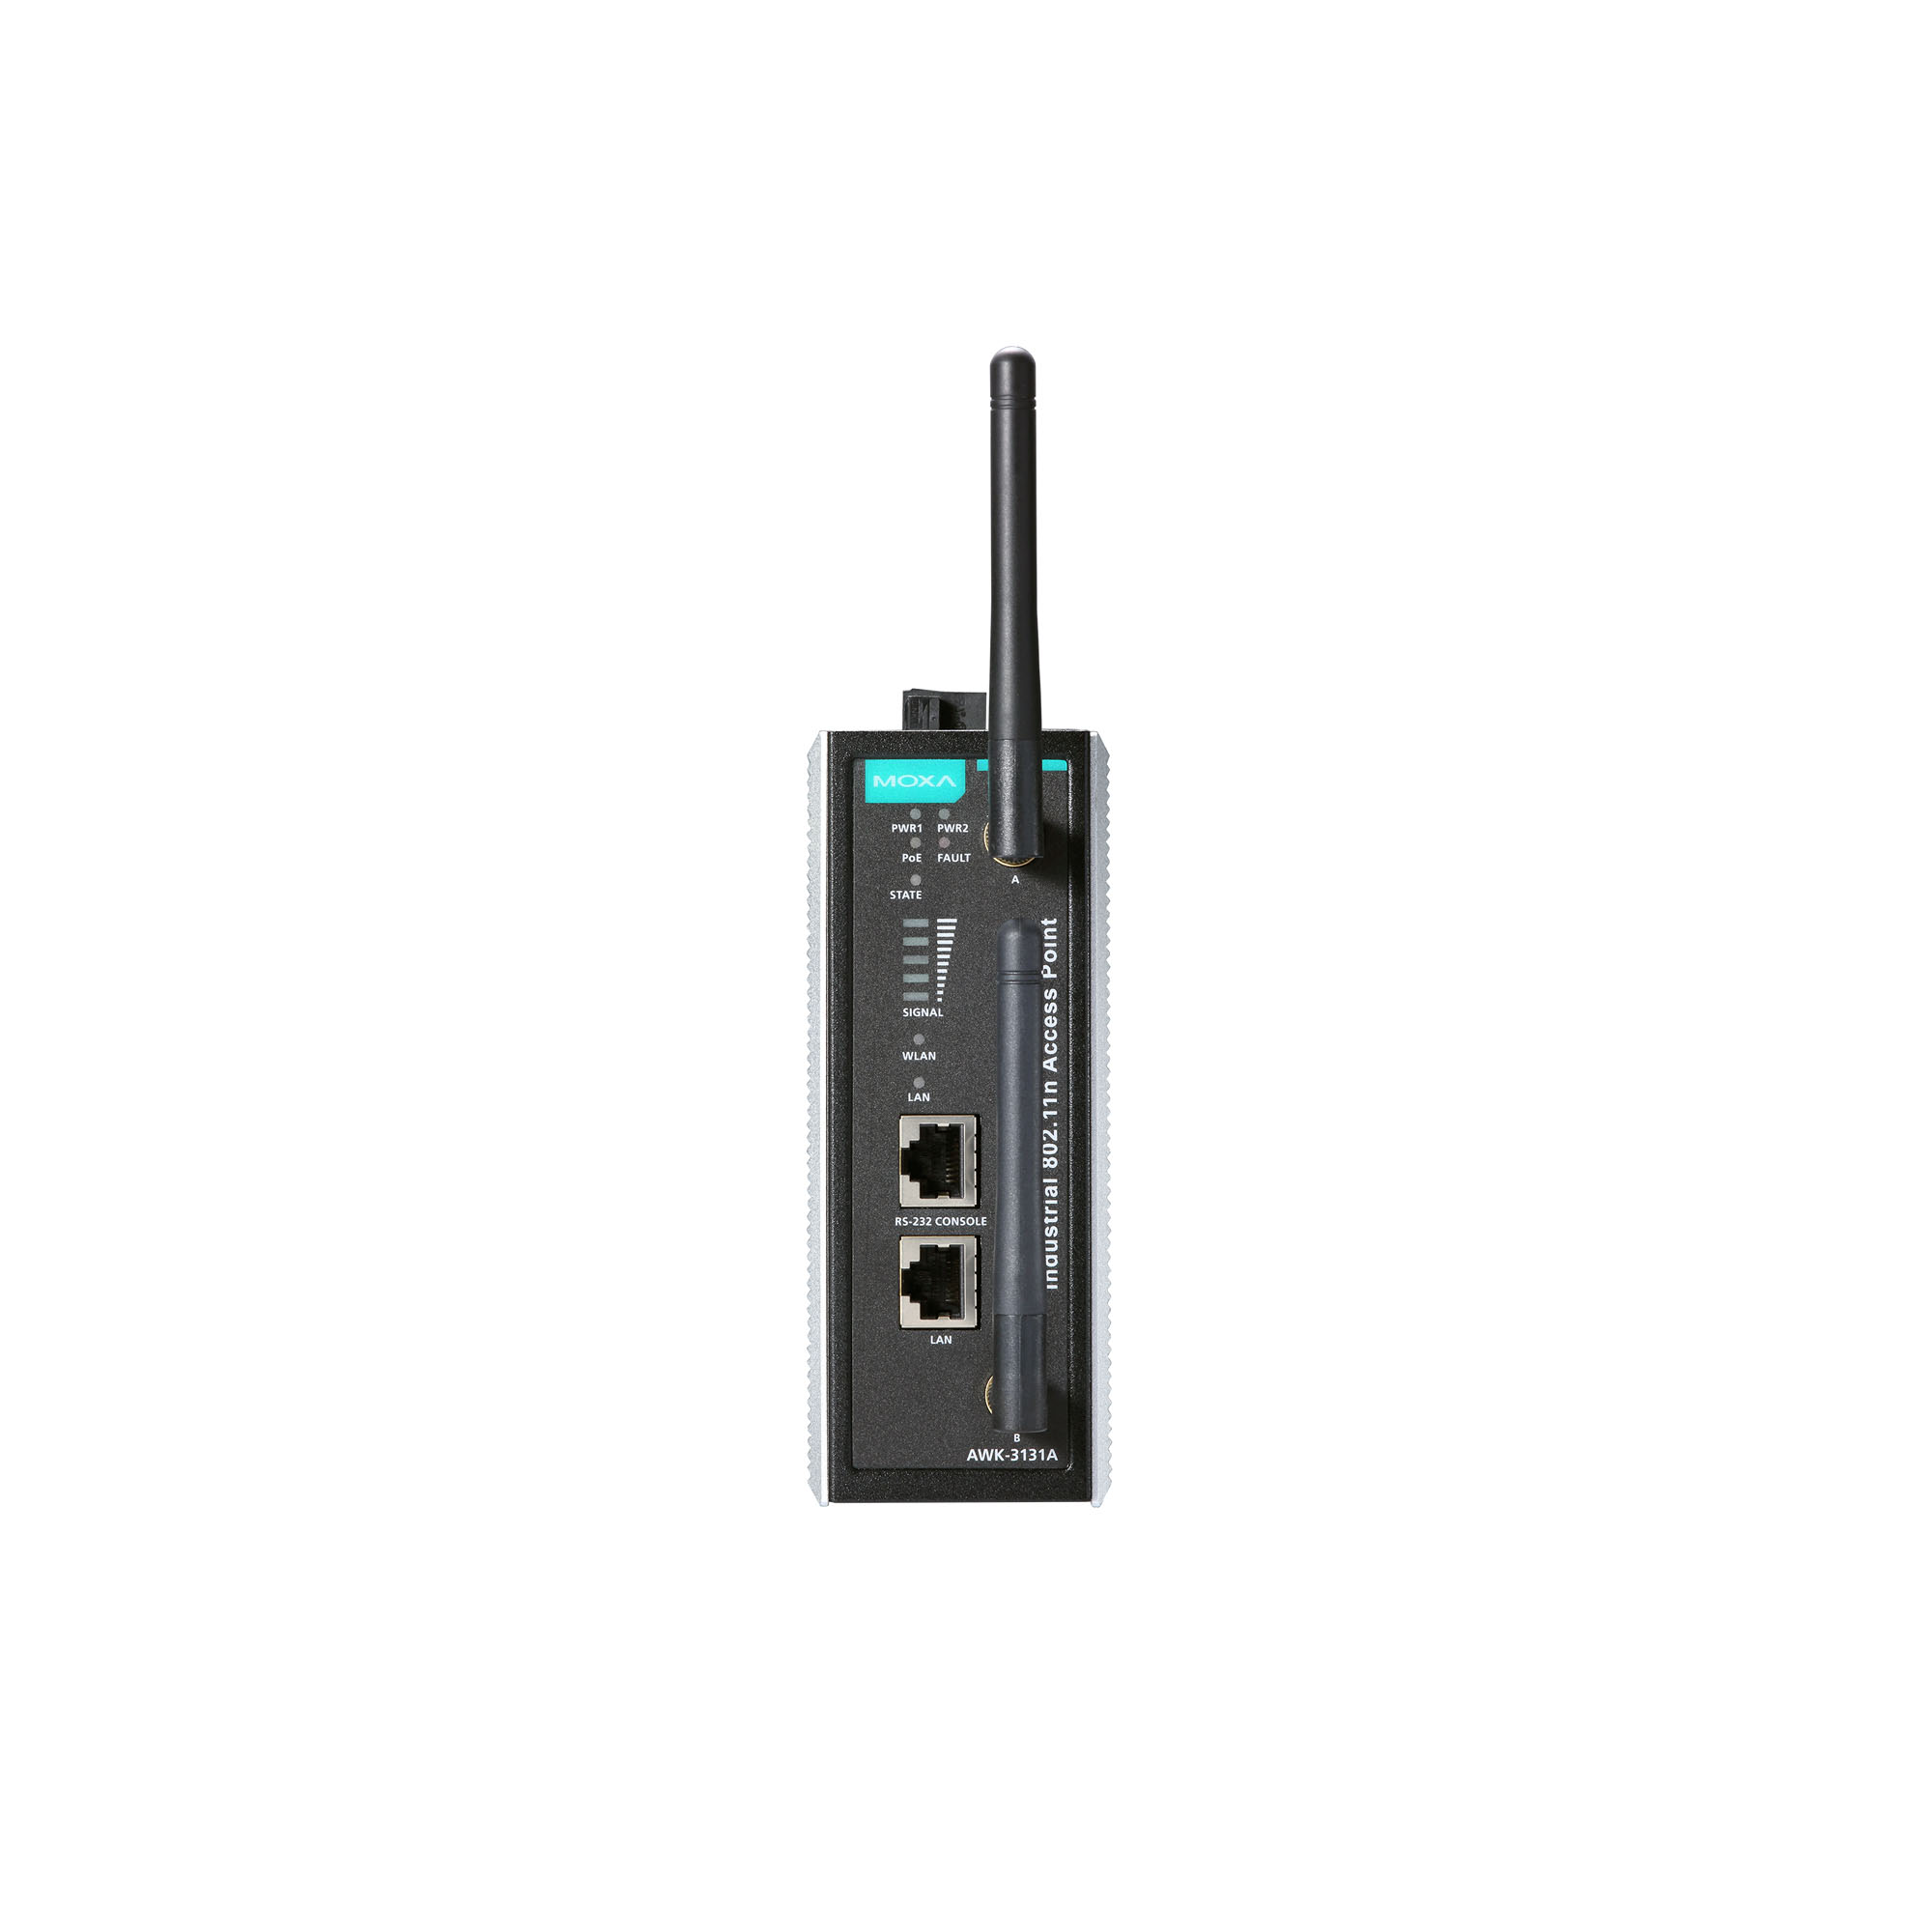 AWK-3131A Series - WLAN AP/Bridge/Client   MOXA